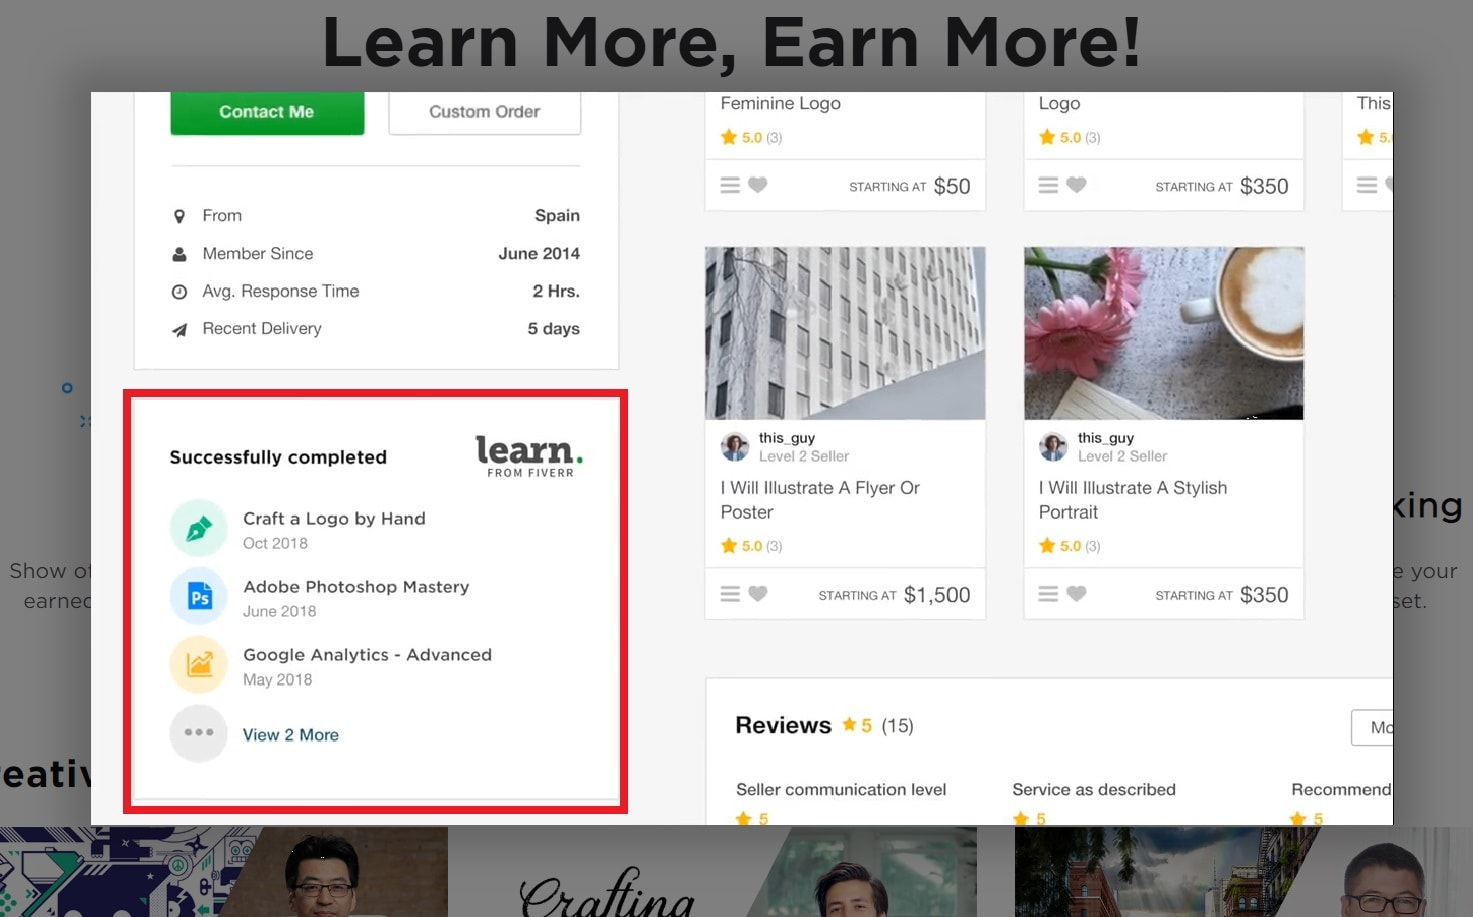 Online Course Comparison – Fiverr Learn vs Udemy vs Coursera-image12